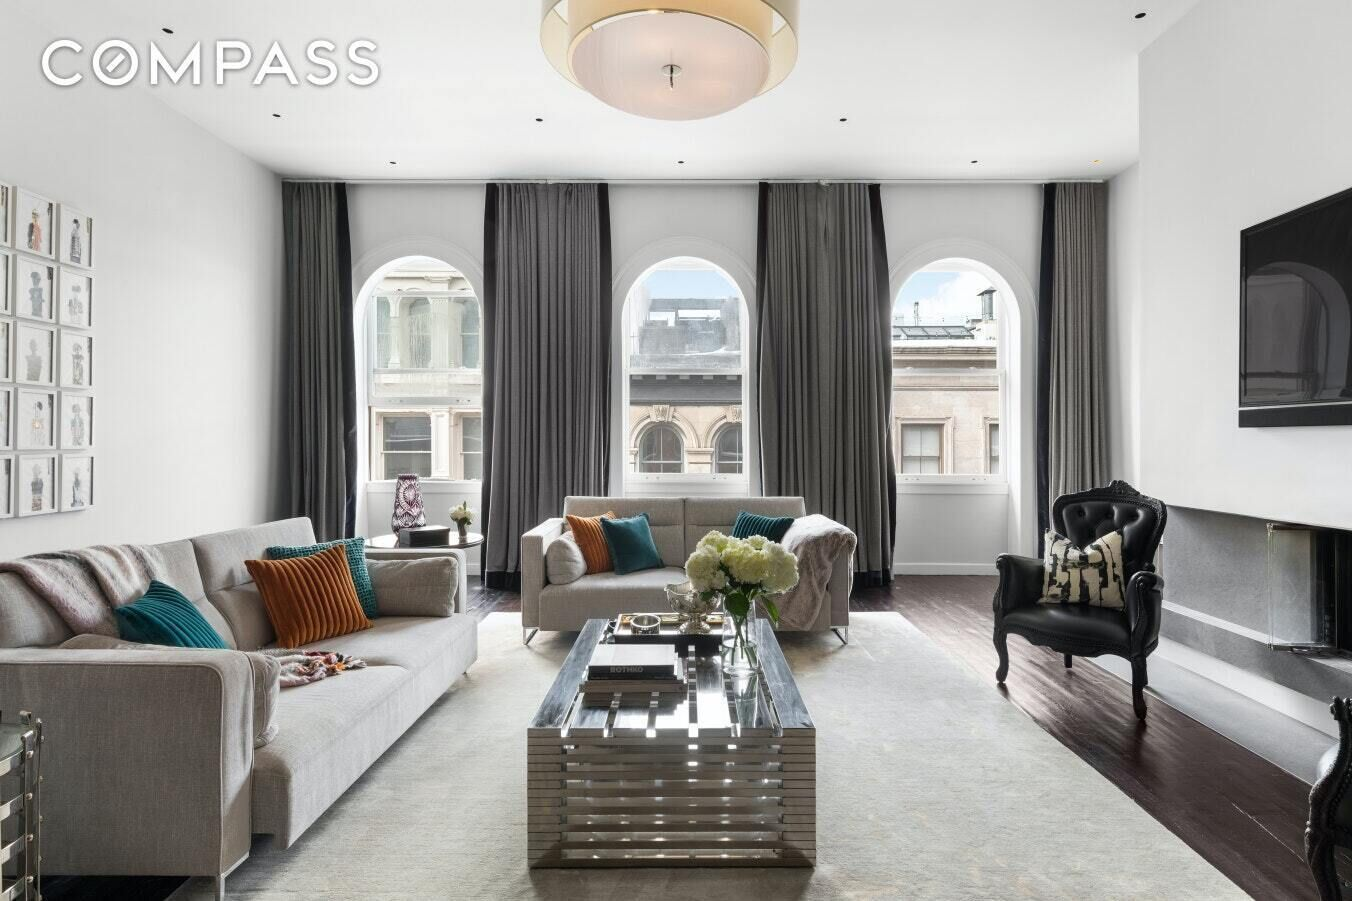 Apartment for sale at 22 Mercer Street, Apt PH-C